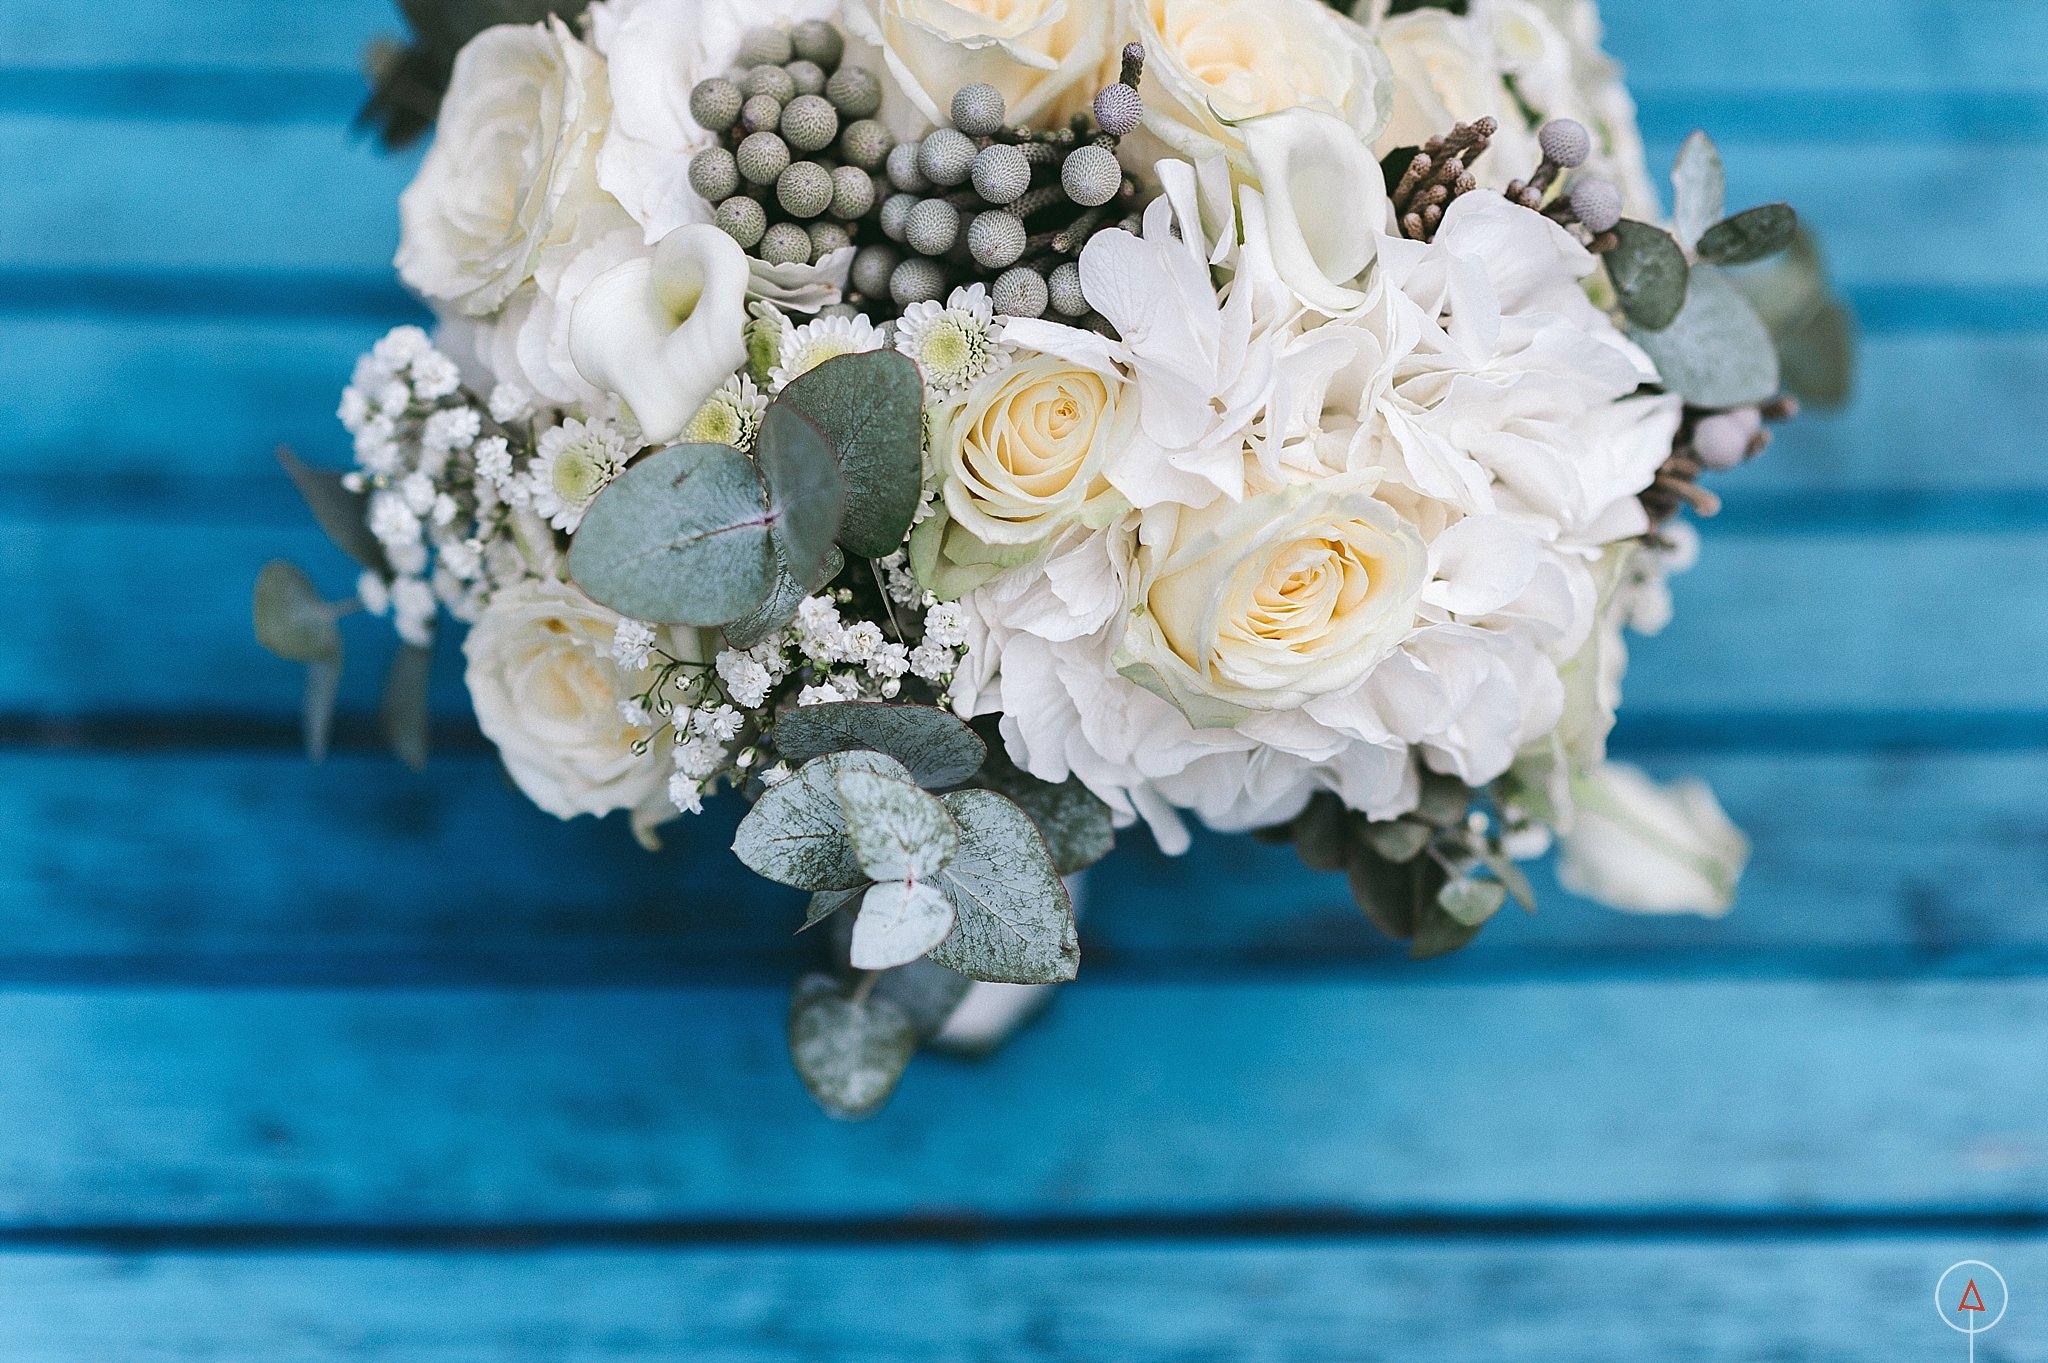 cardiff-wedding-photographer-aga-tomaszek_0319